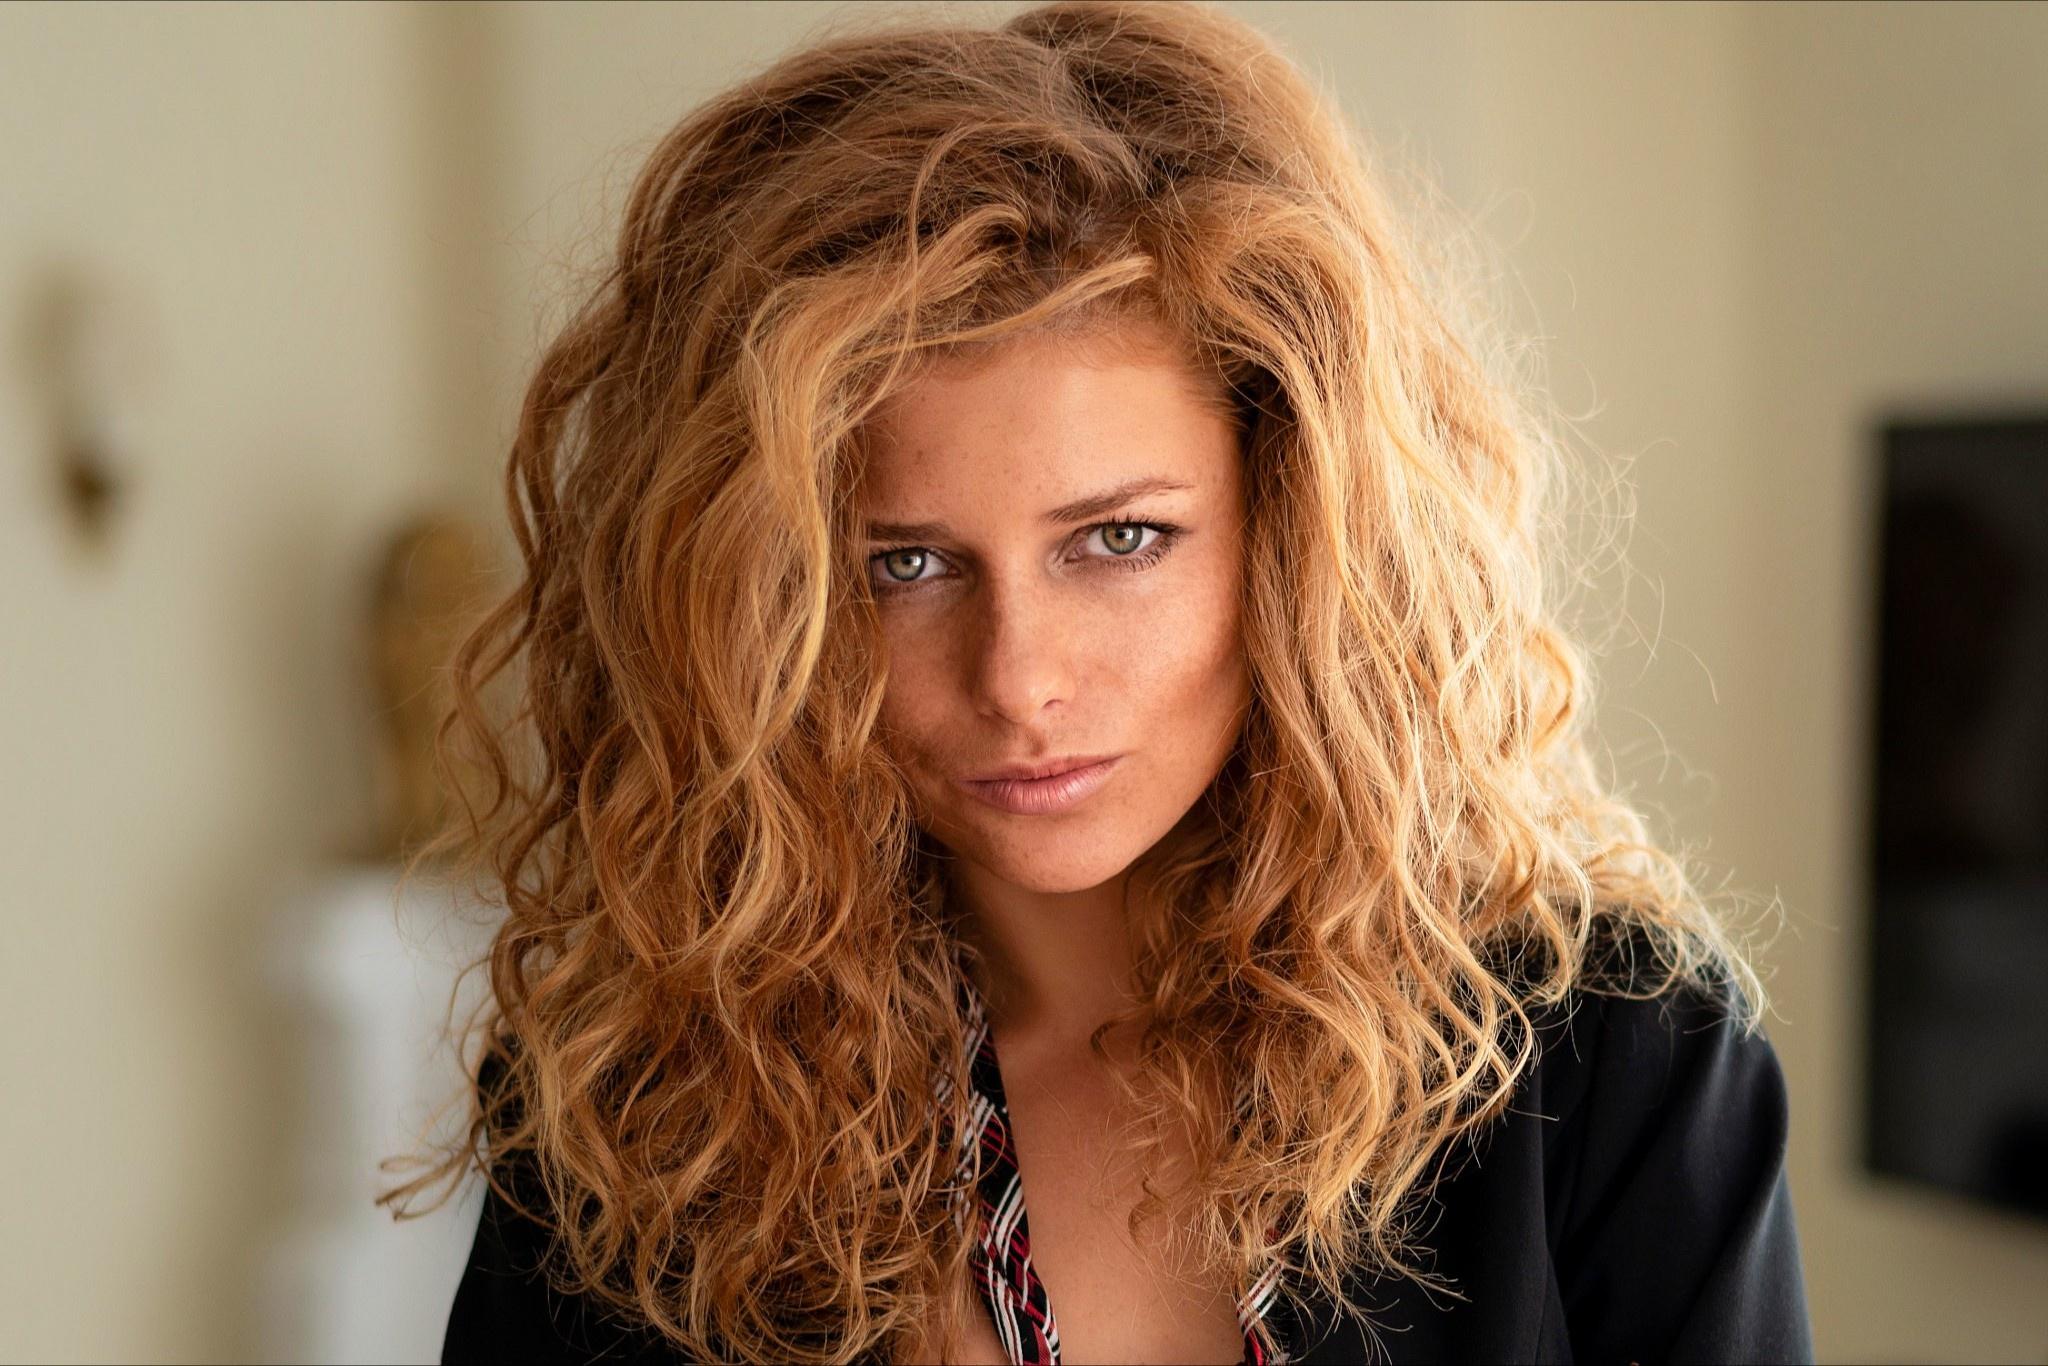 Woman Girl Face Blonde 2048x1366